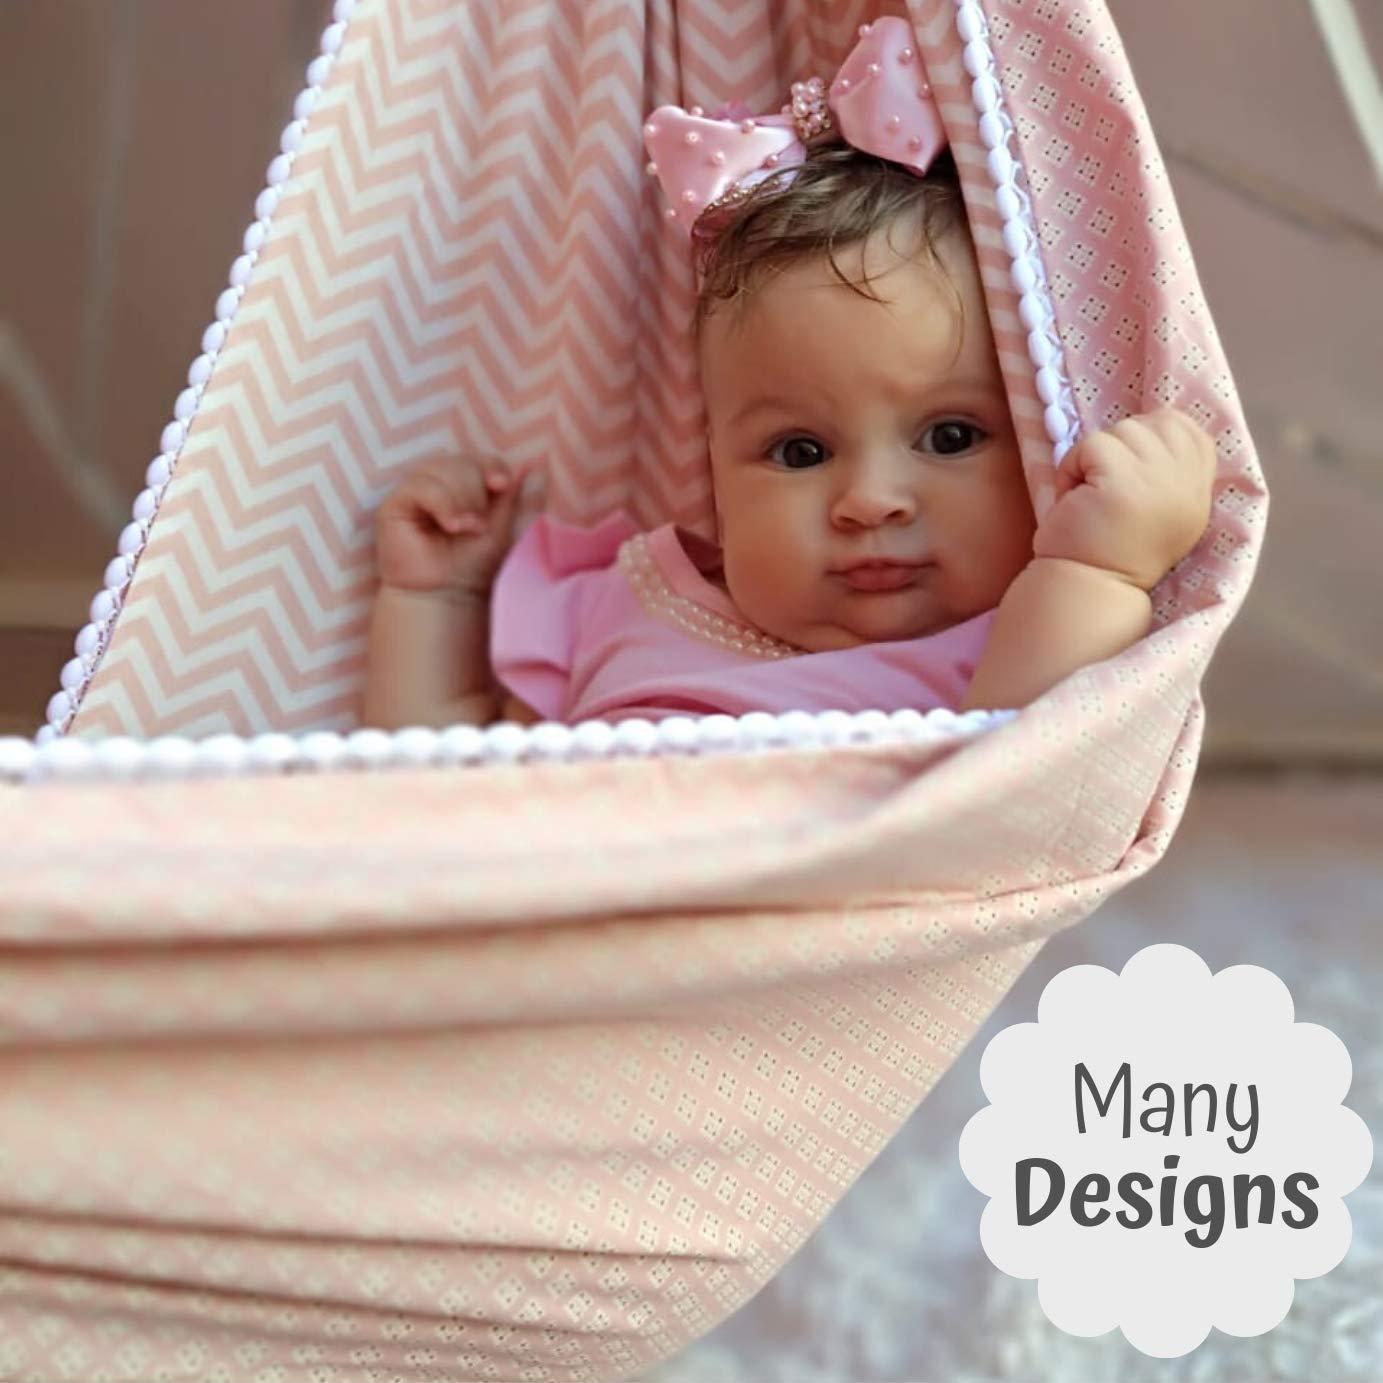 Crib Mattress Swaddle Up Baby Products Baby Crib Baby Stuff For Newborn Swing Set Baby Deals Bed Baby Stuff Hammock Underquilt Infant Hammock Newborn Babies Baby Swing